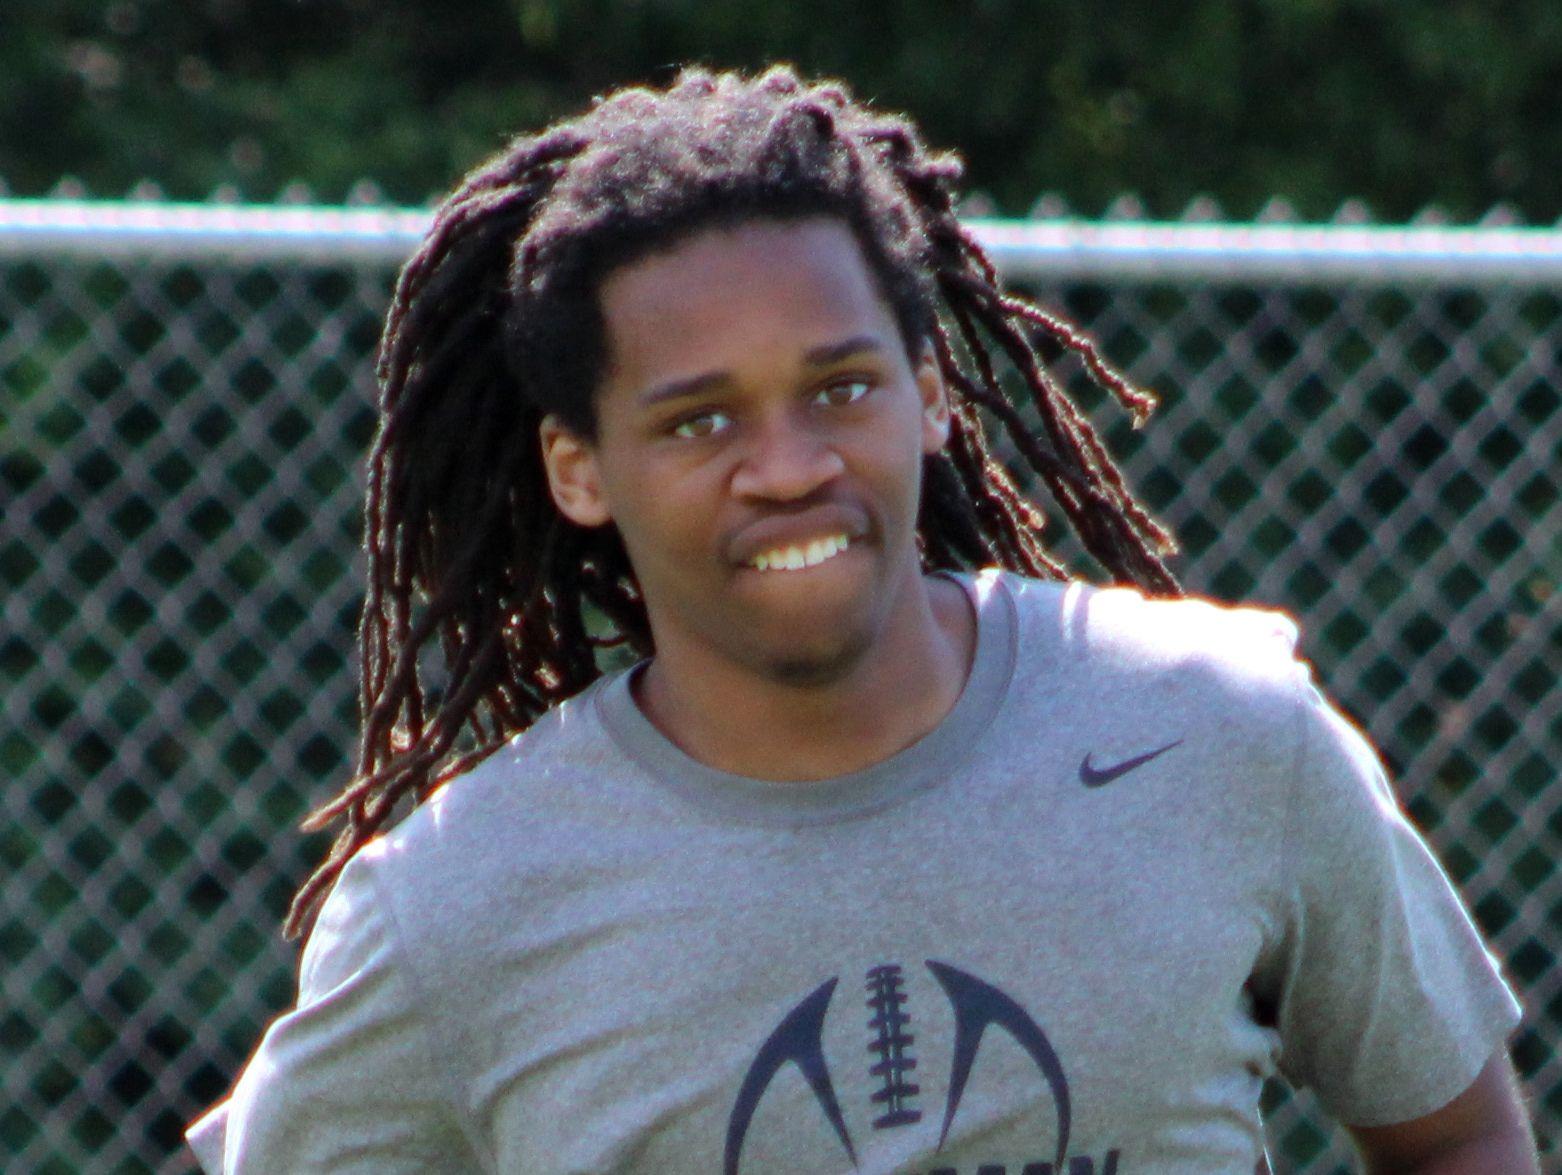 Franklin Road Academy running back Adonis Otey